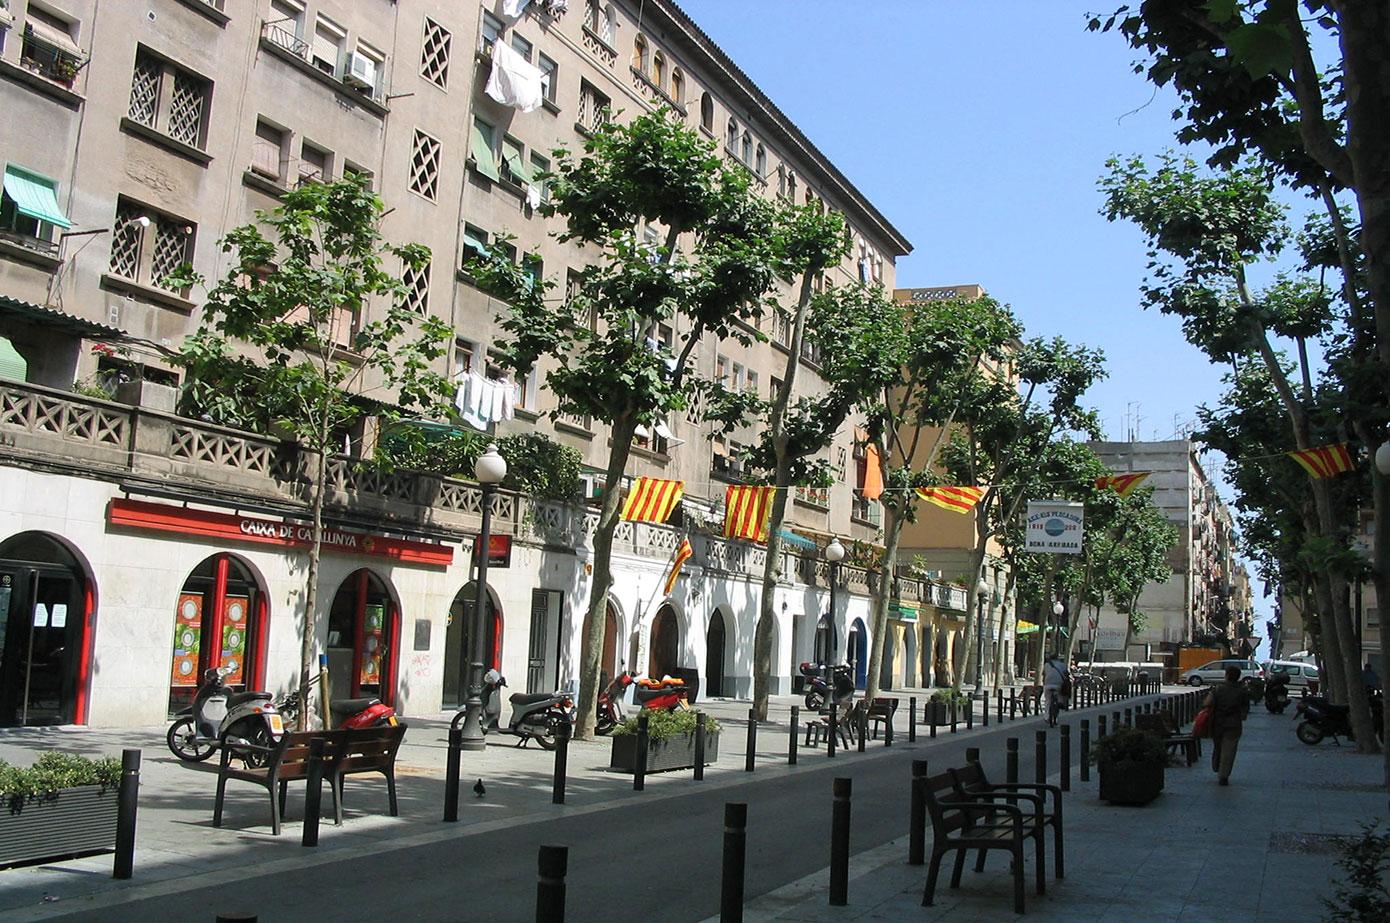 Casco antiguo del barrio de la barceloneta knowing barcelona - Casco antiguo de barcelona ...